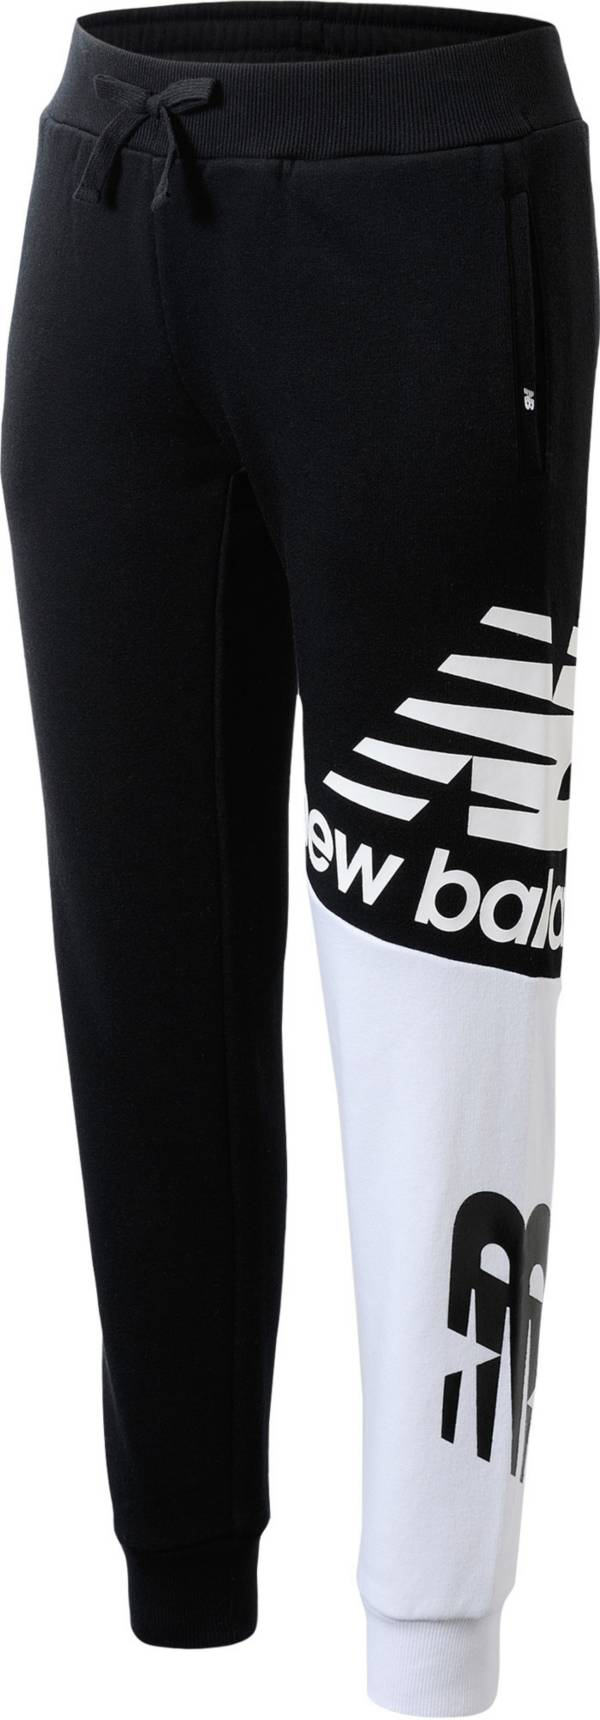 New Balance Girls' Lifestyle Fleece Jogger Pants product image